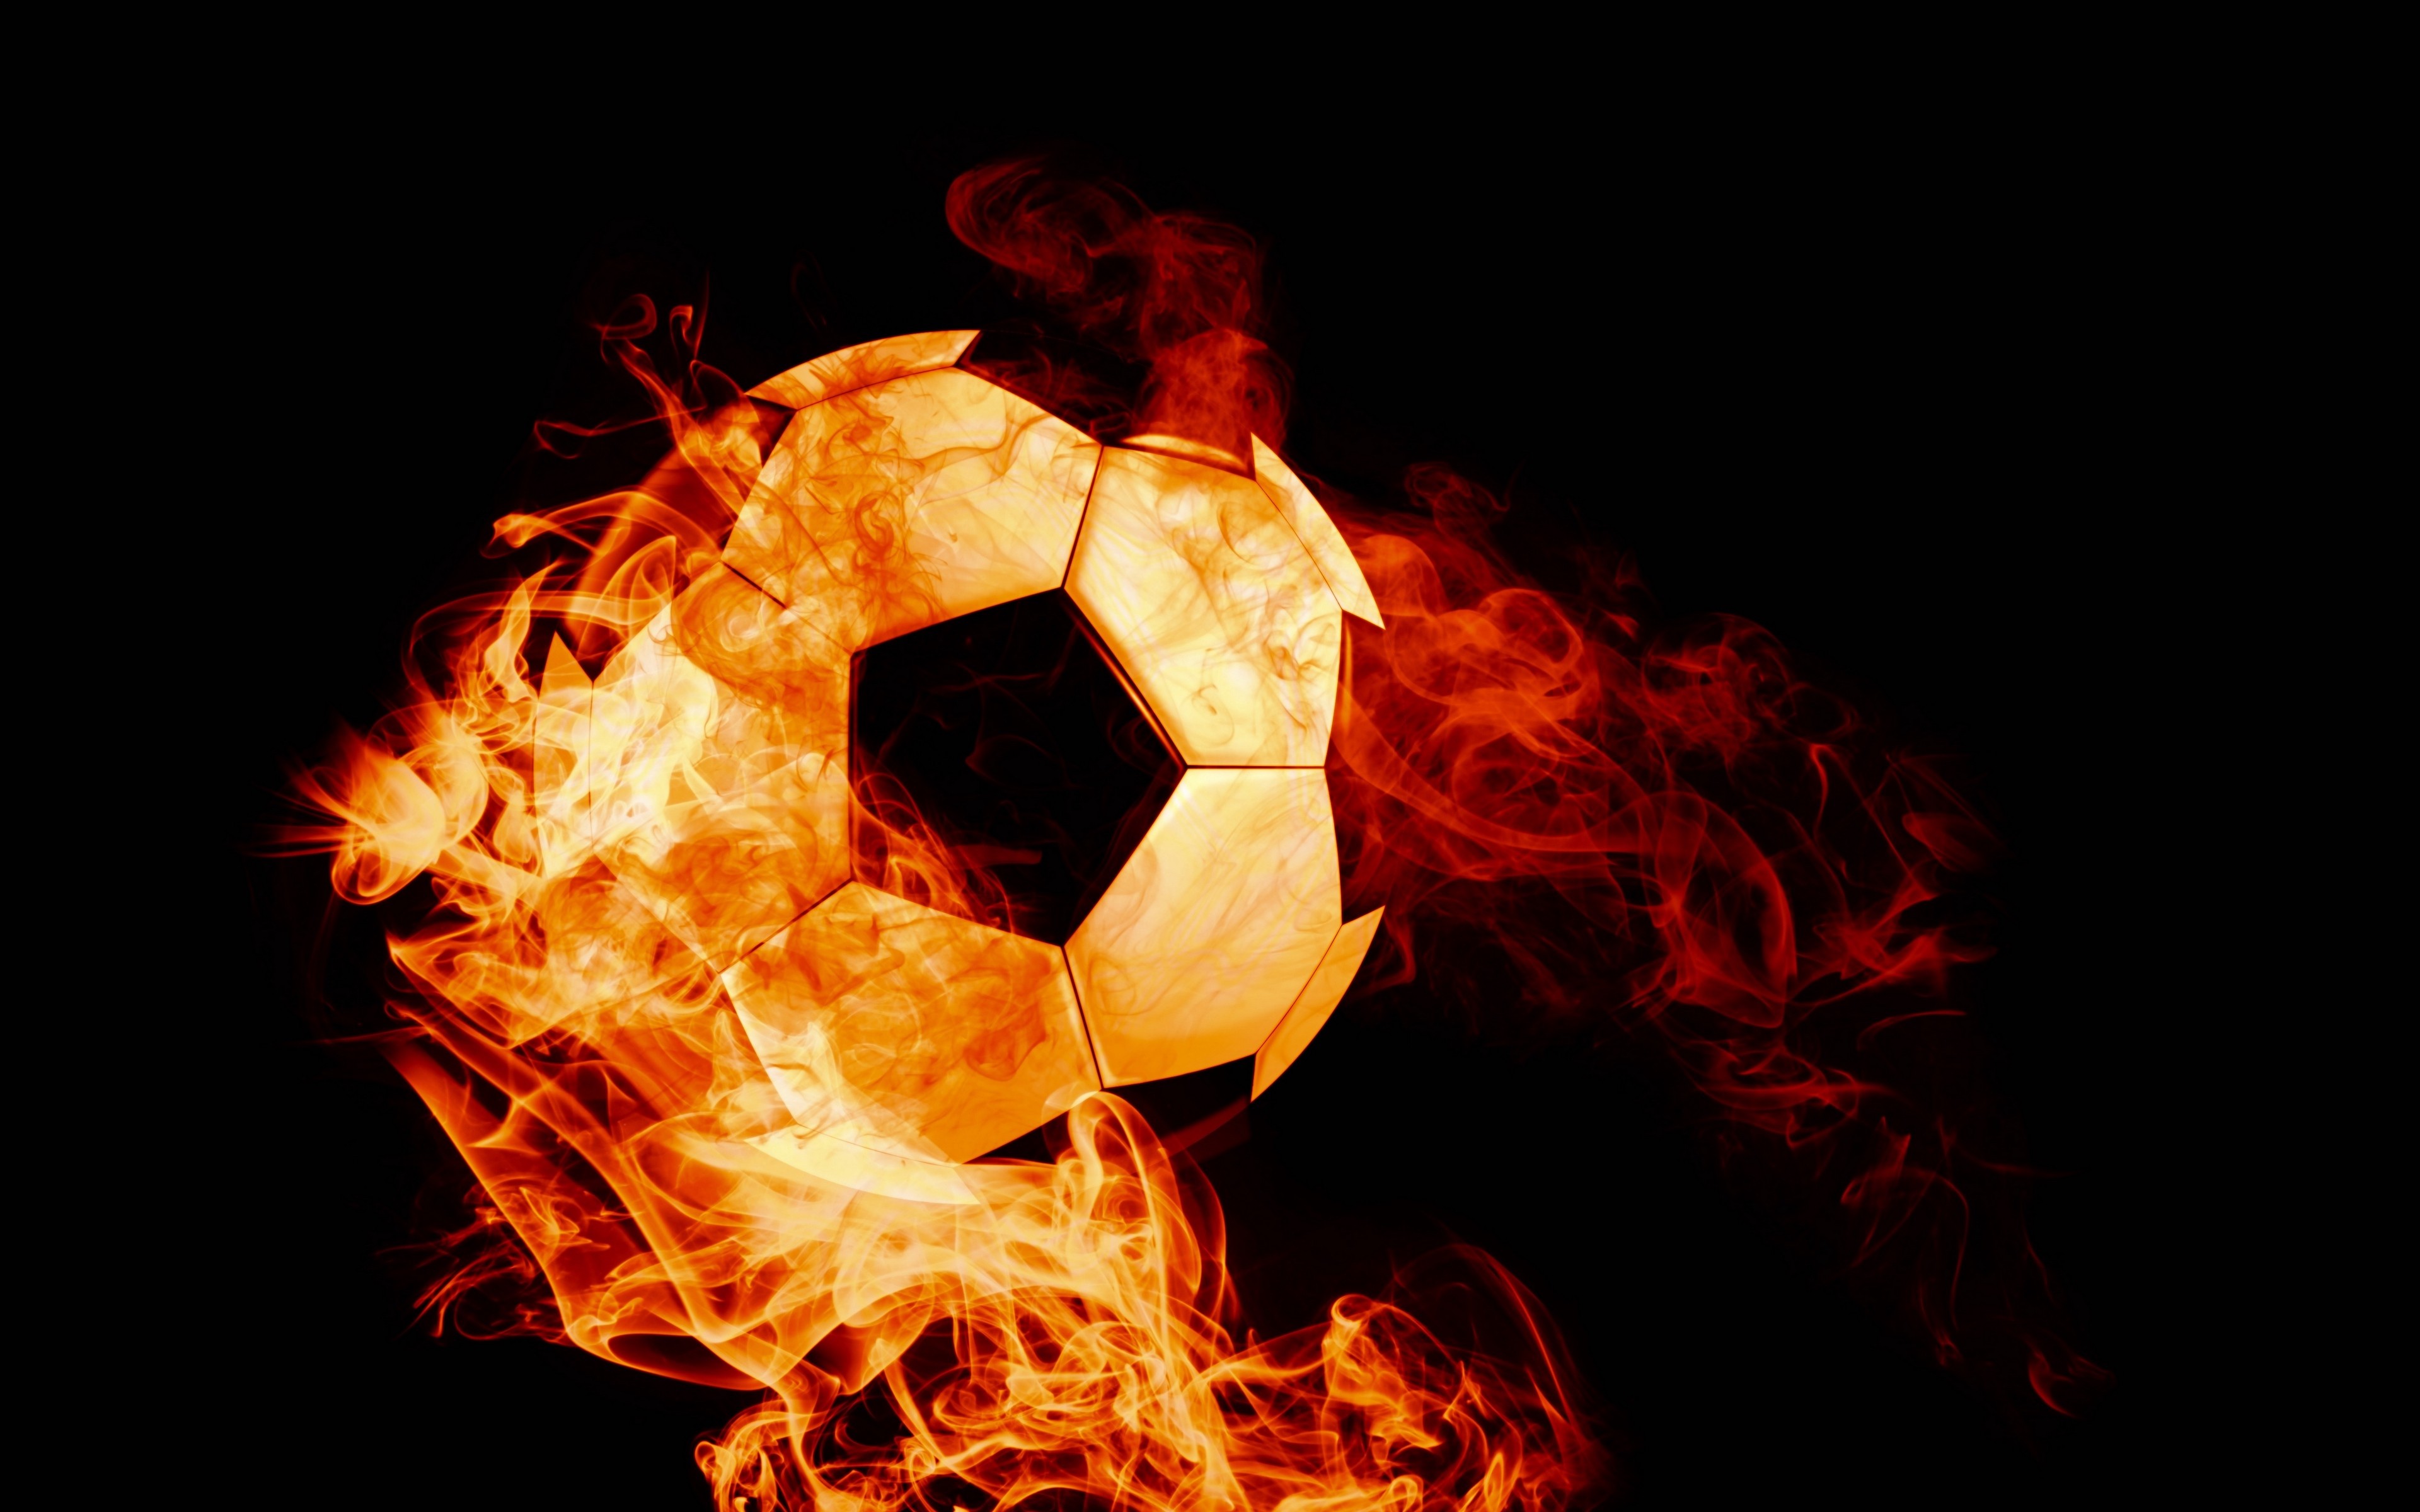 Football Ball In Fire Wallpaper 4k Ultra Hd Id4091